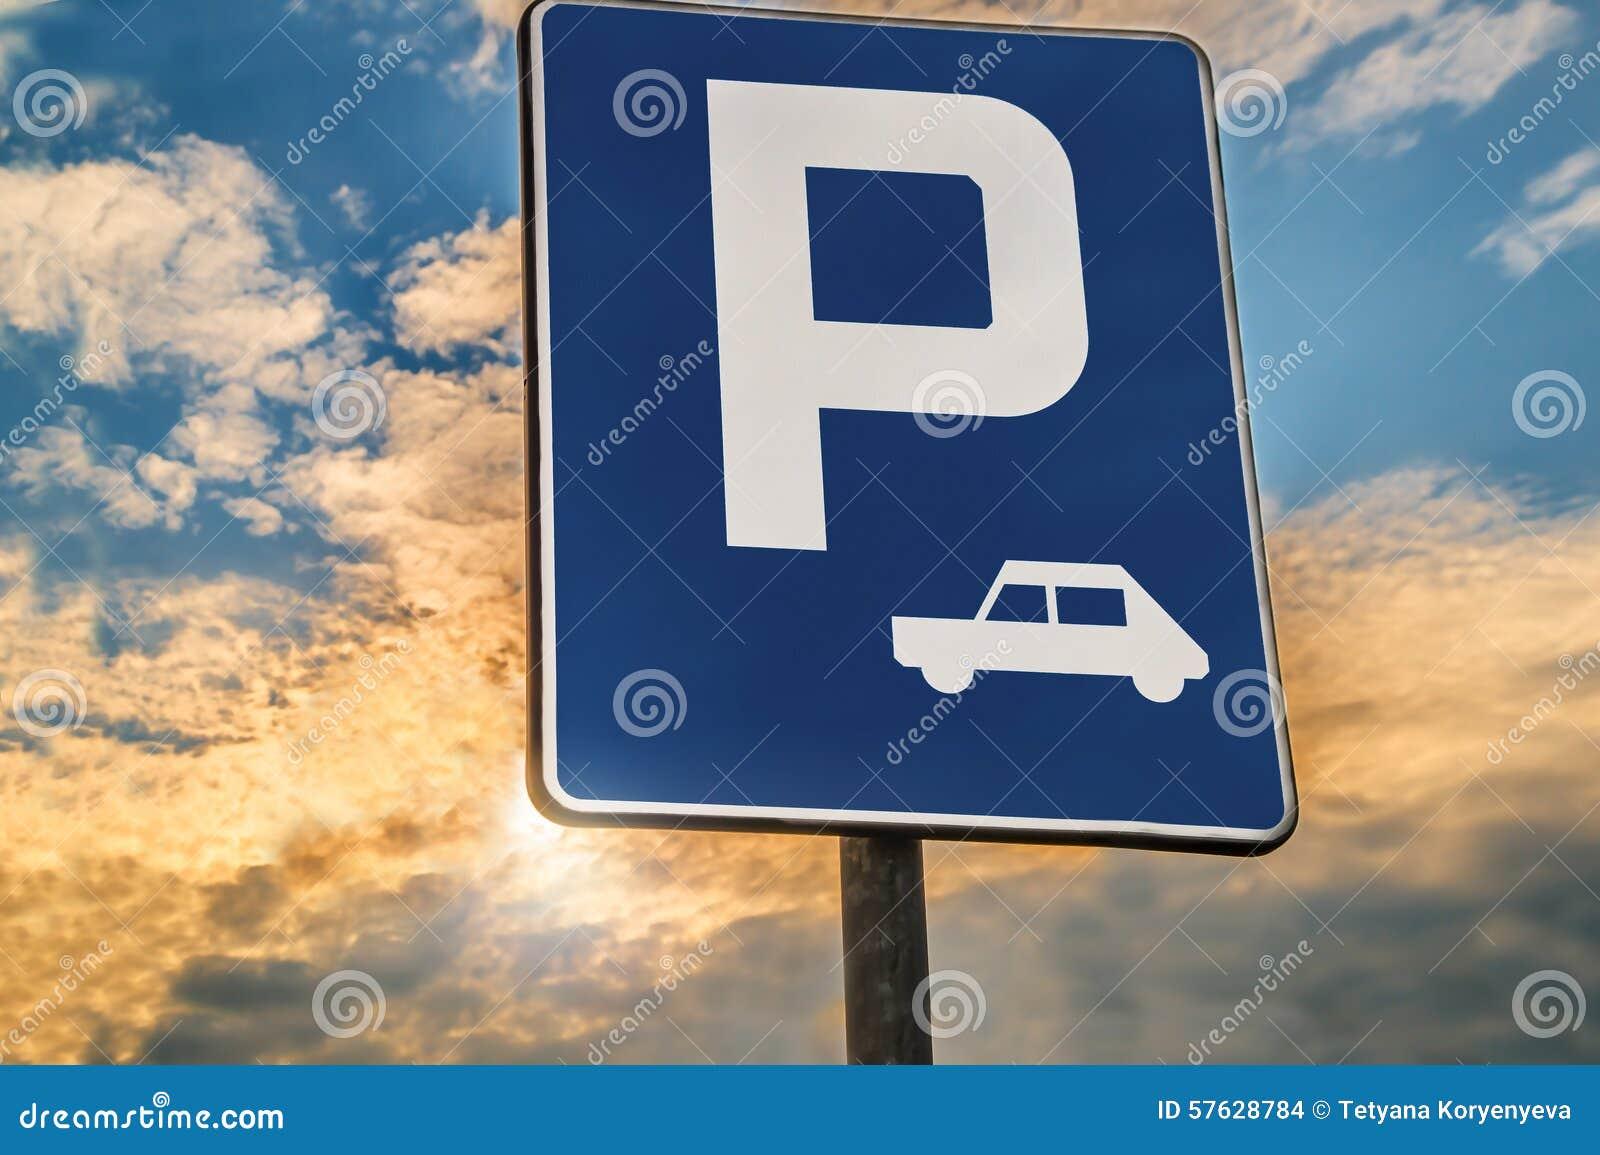 Verkeerstekenparkeerterrein of Rust einde